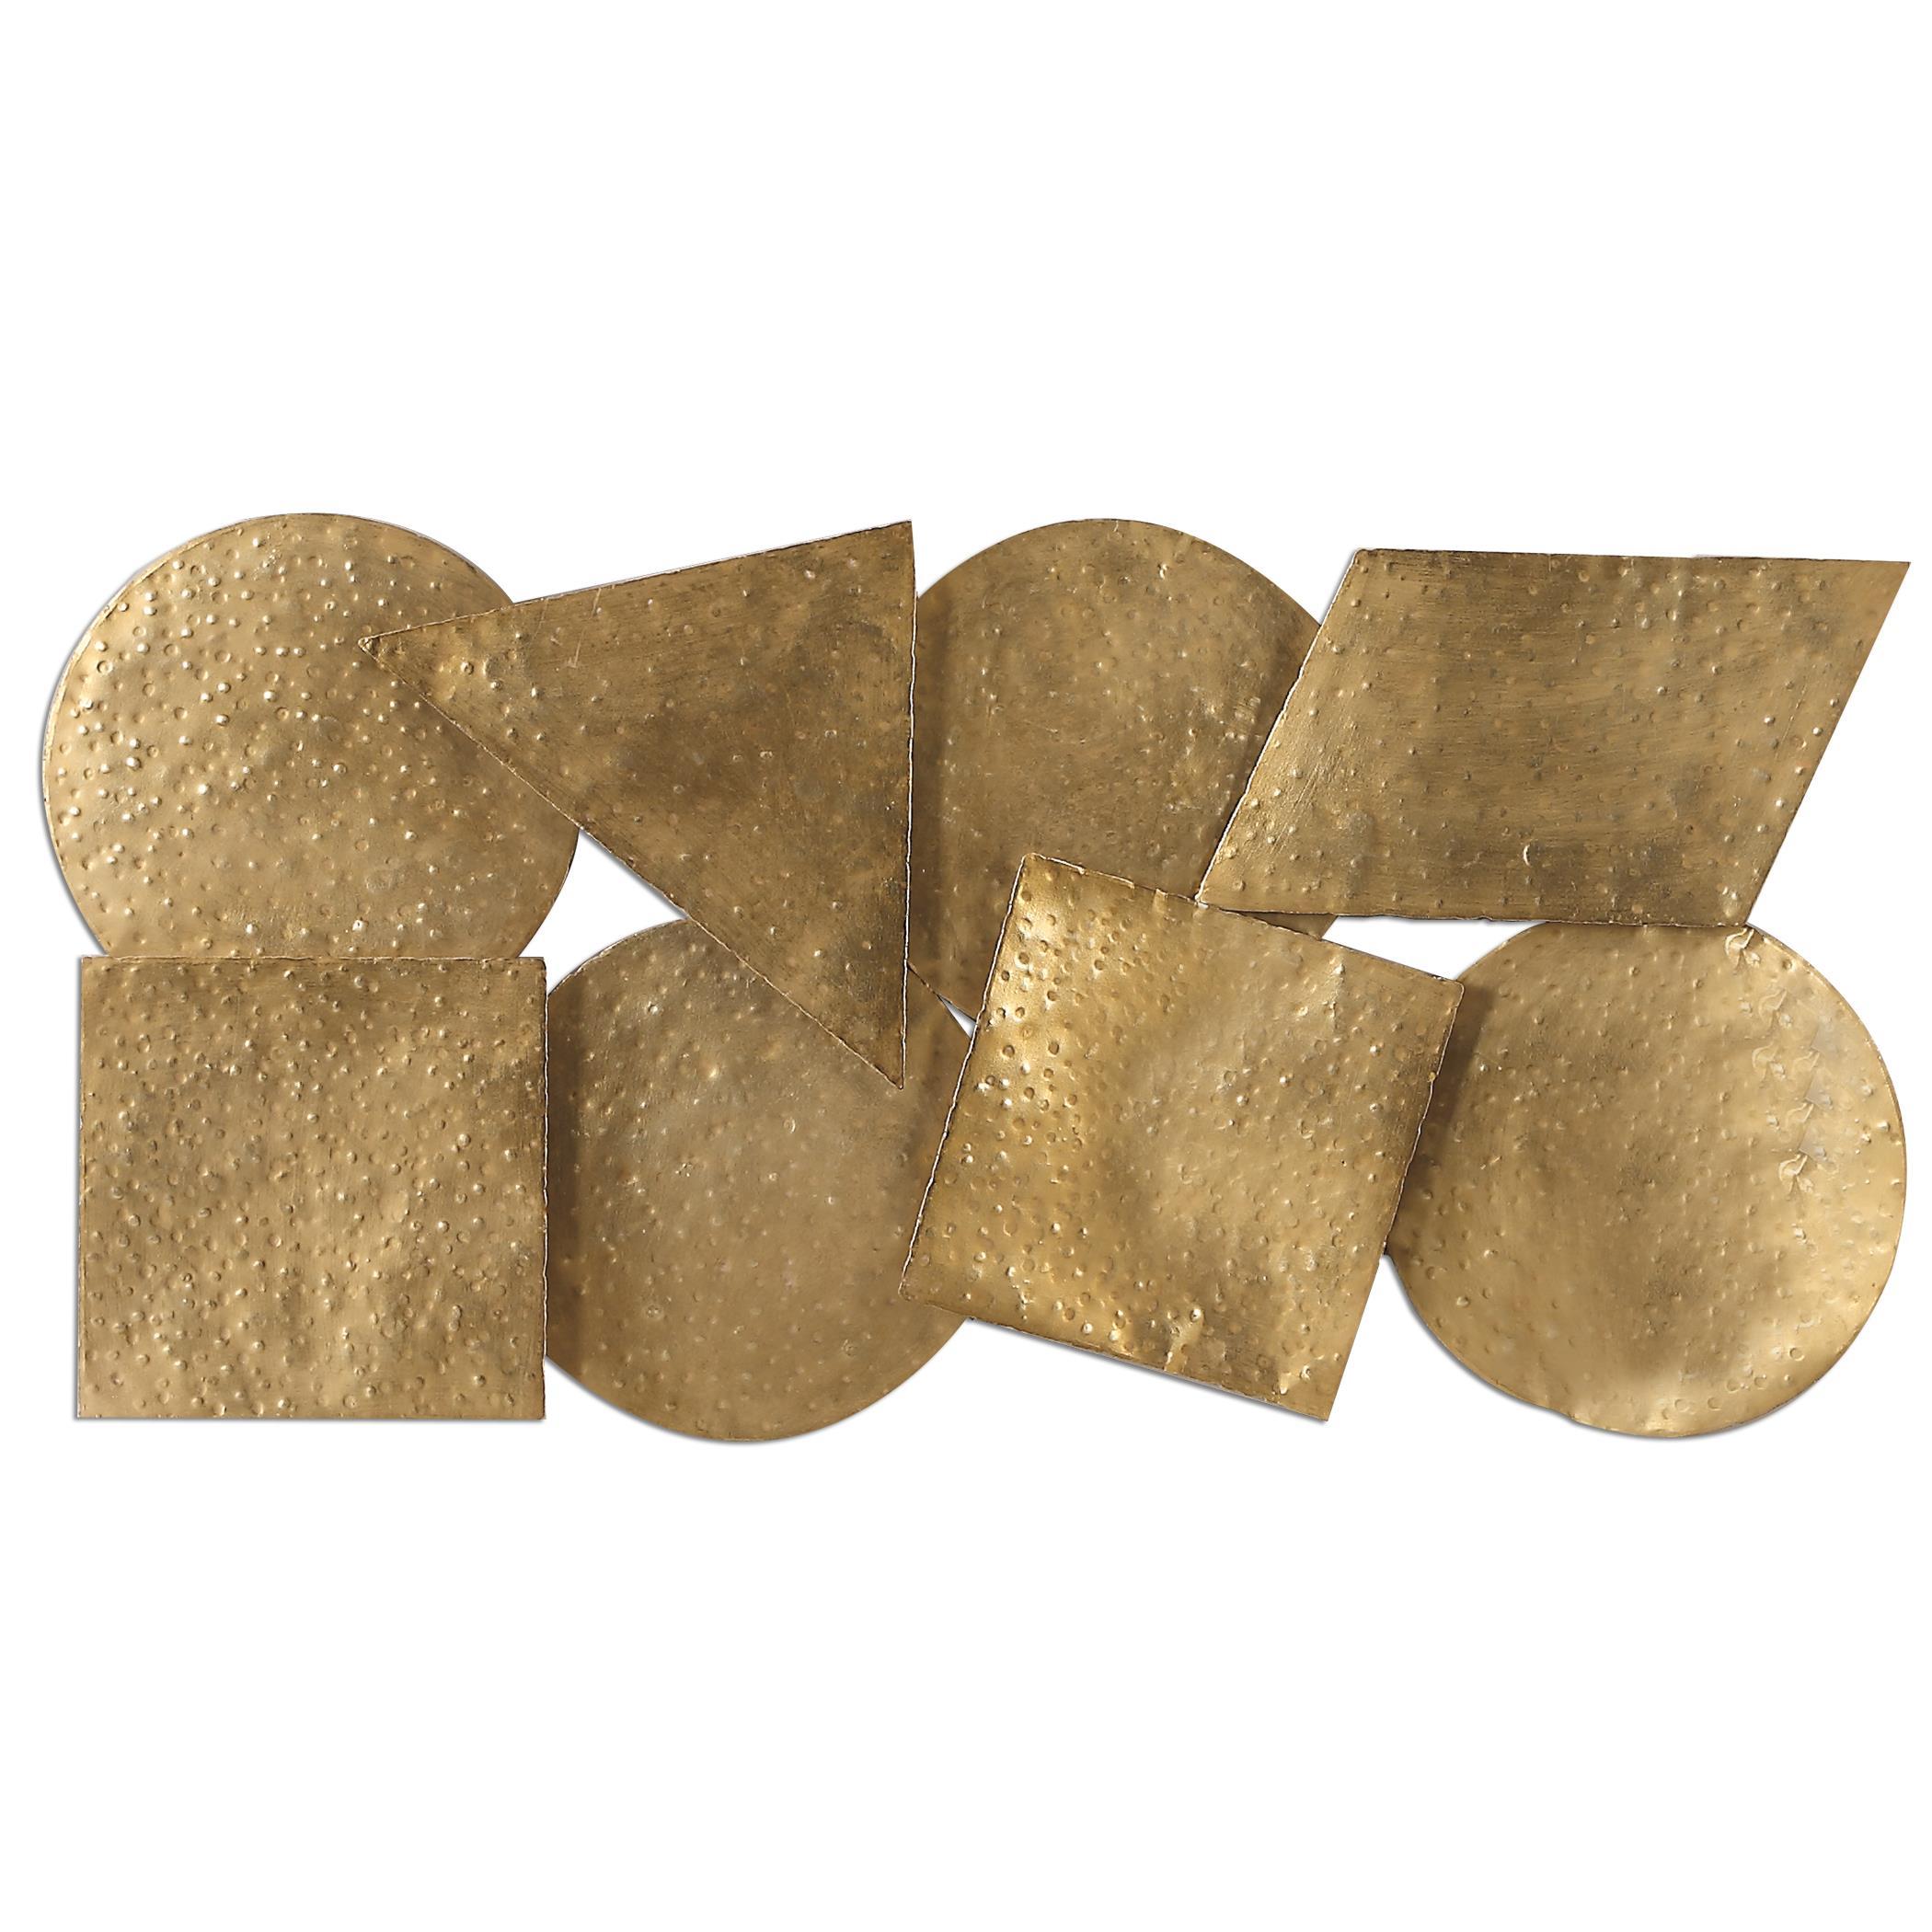 Uttermost Alternative Wall Decor Arrigo Gold Wall Art - Item Number: 07074